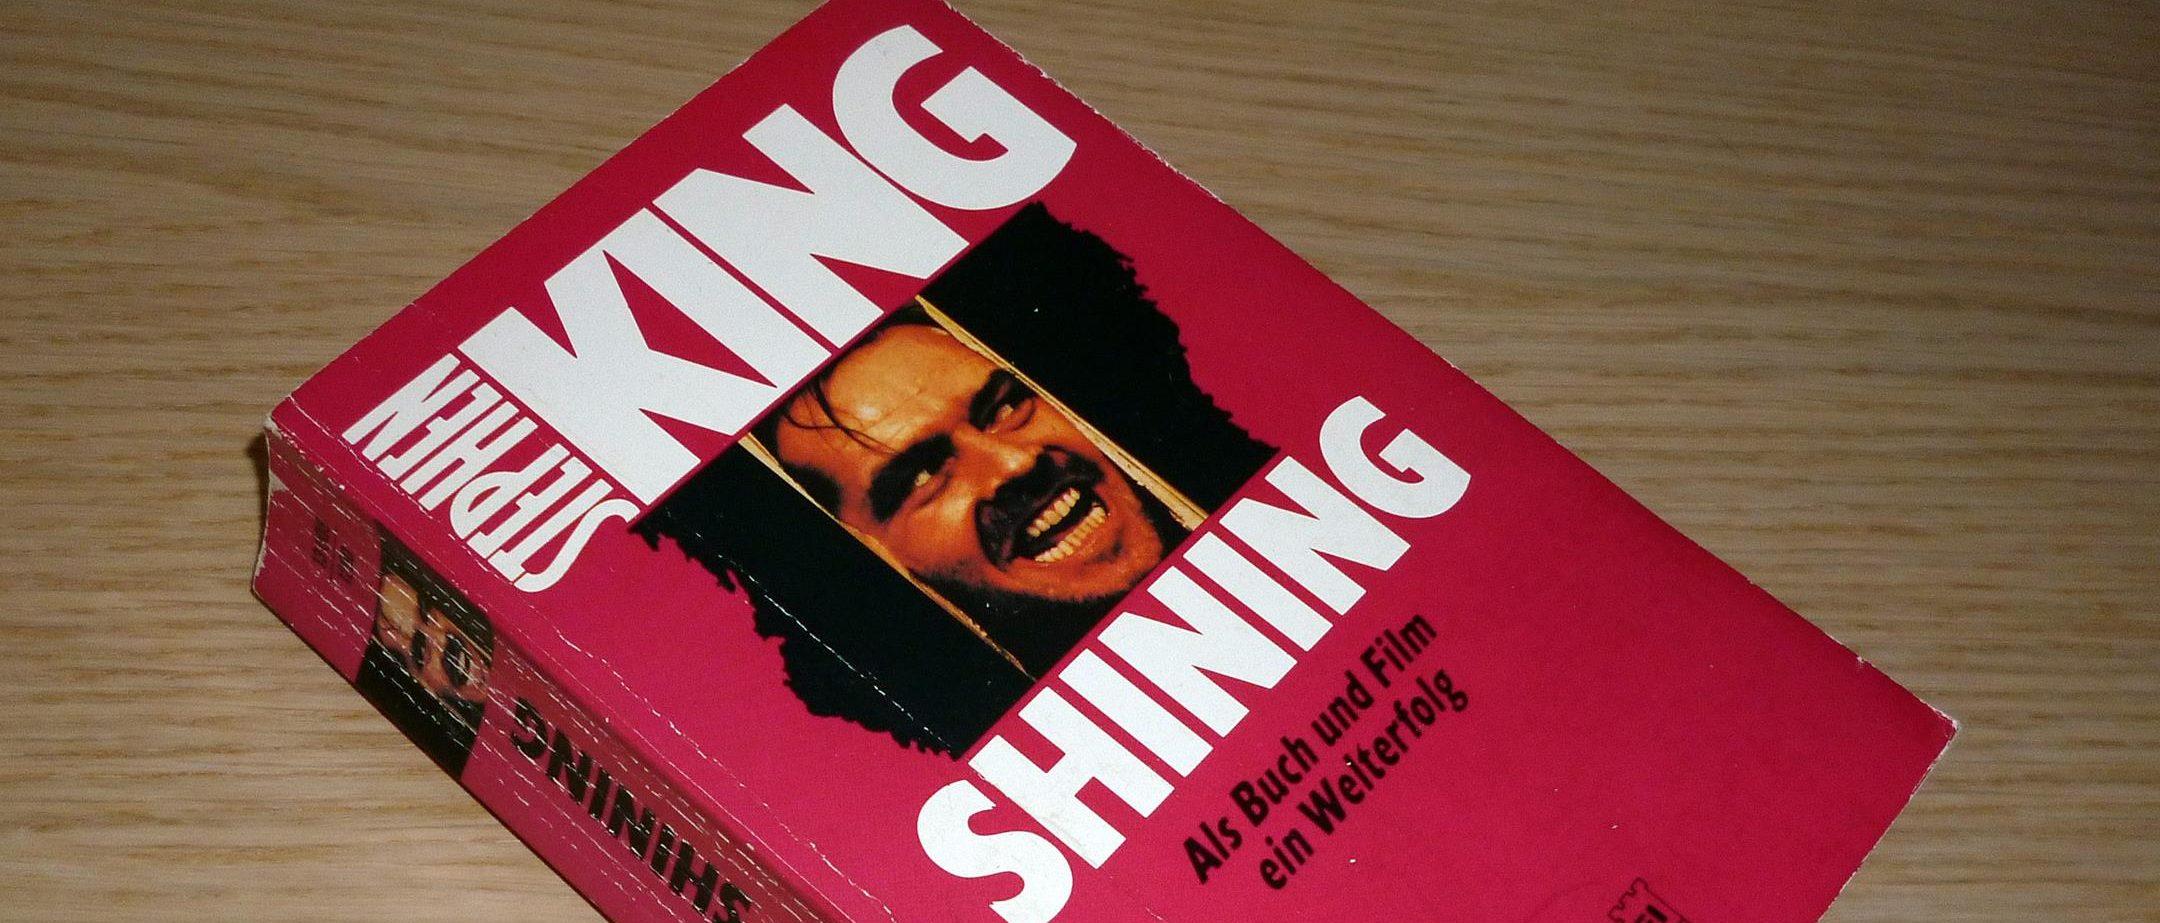 Shining_Stephen King